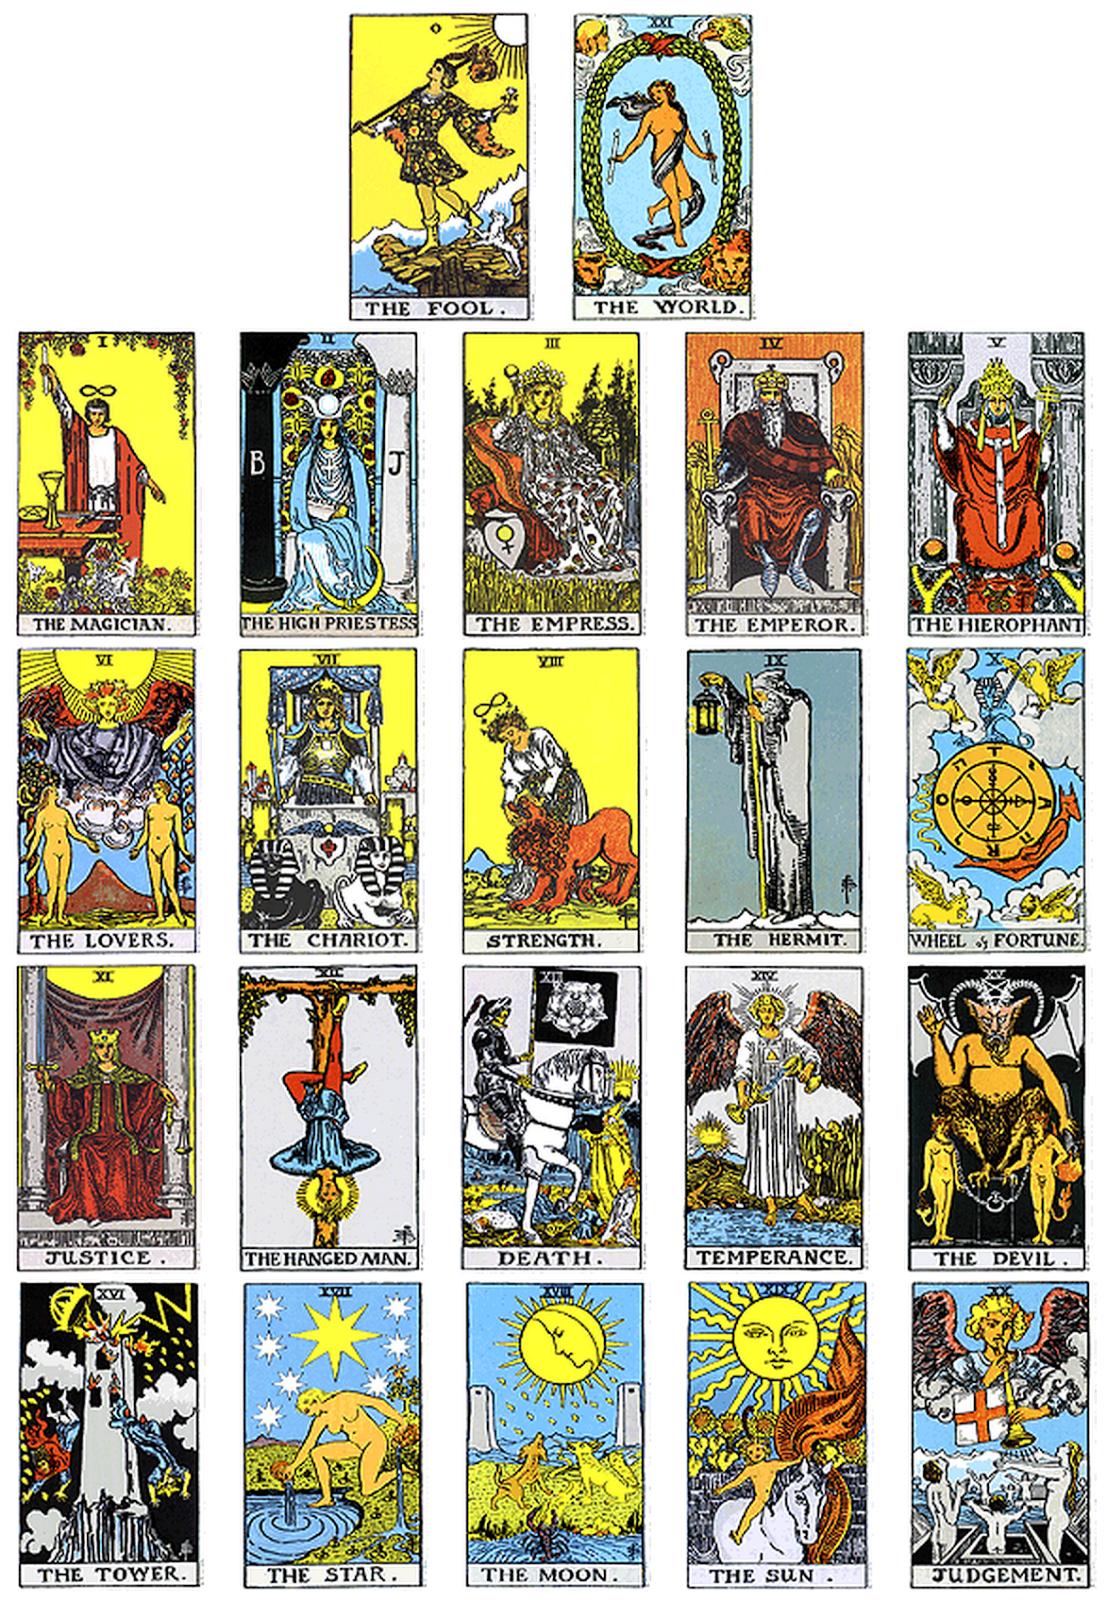 Major Arcana Png 1107 1600 Major Arcana Cards Major Arcana Meanings Tarot Cards Major Arcana